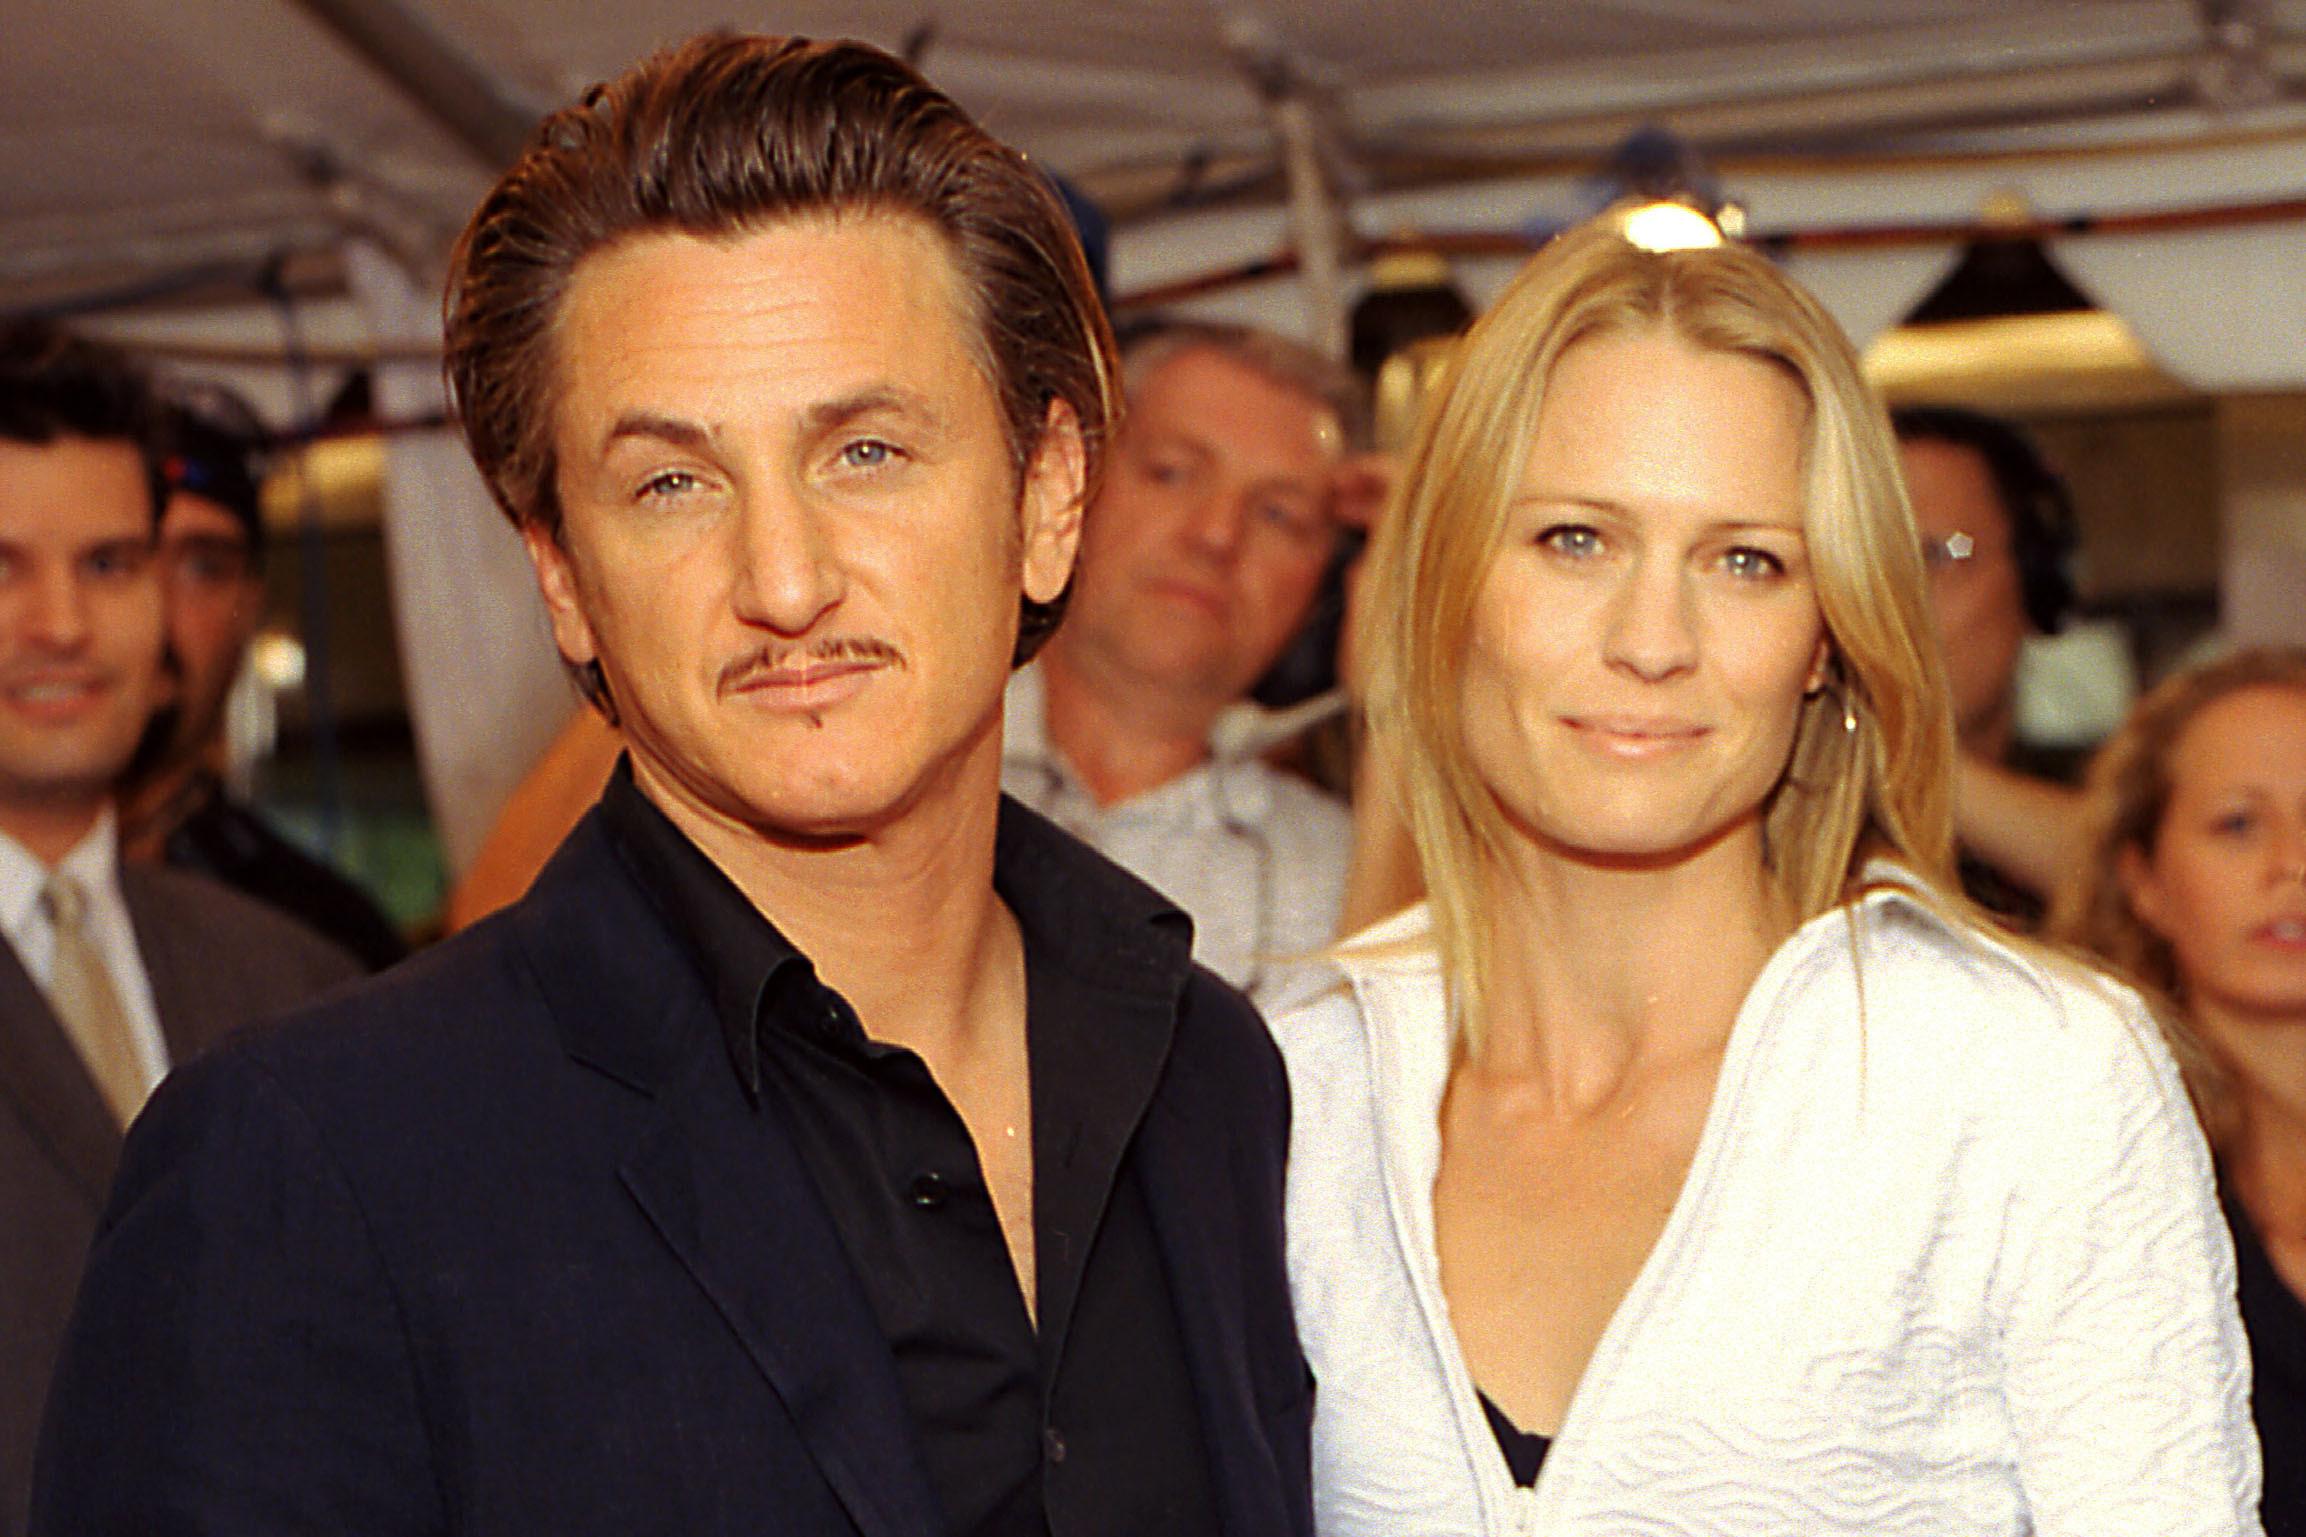 Parents: Sean Penn And Robin Wright